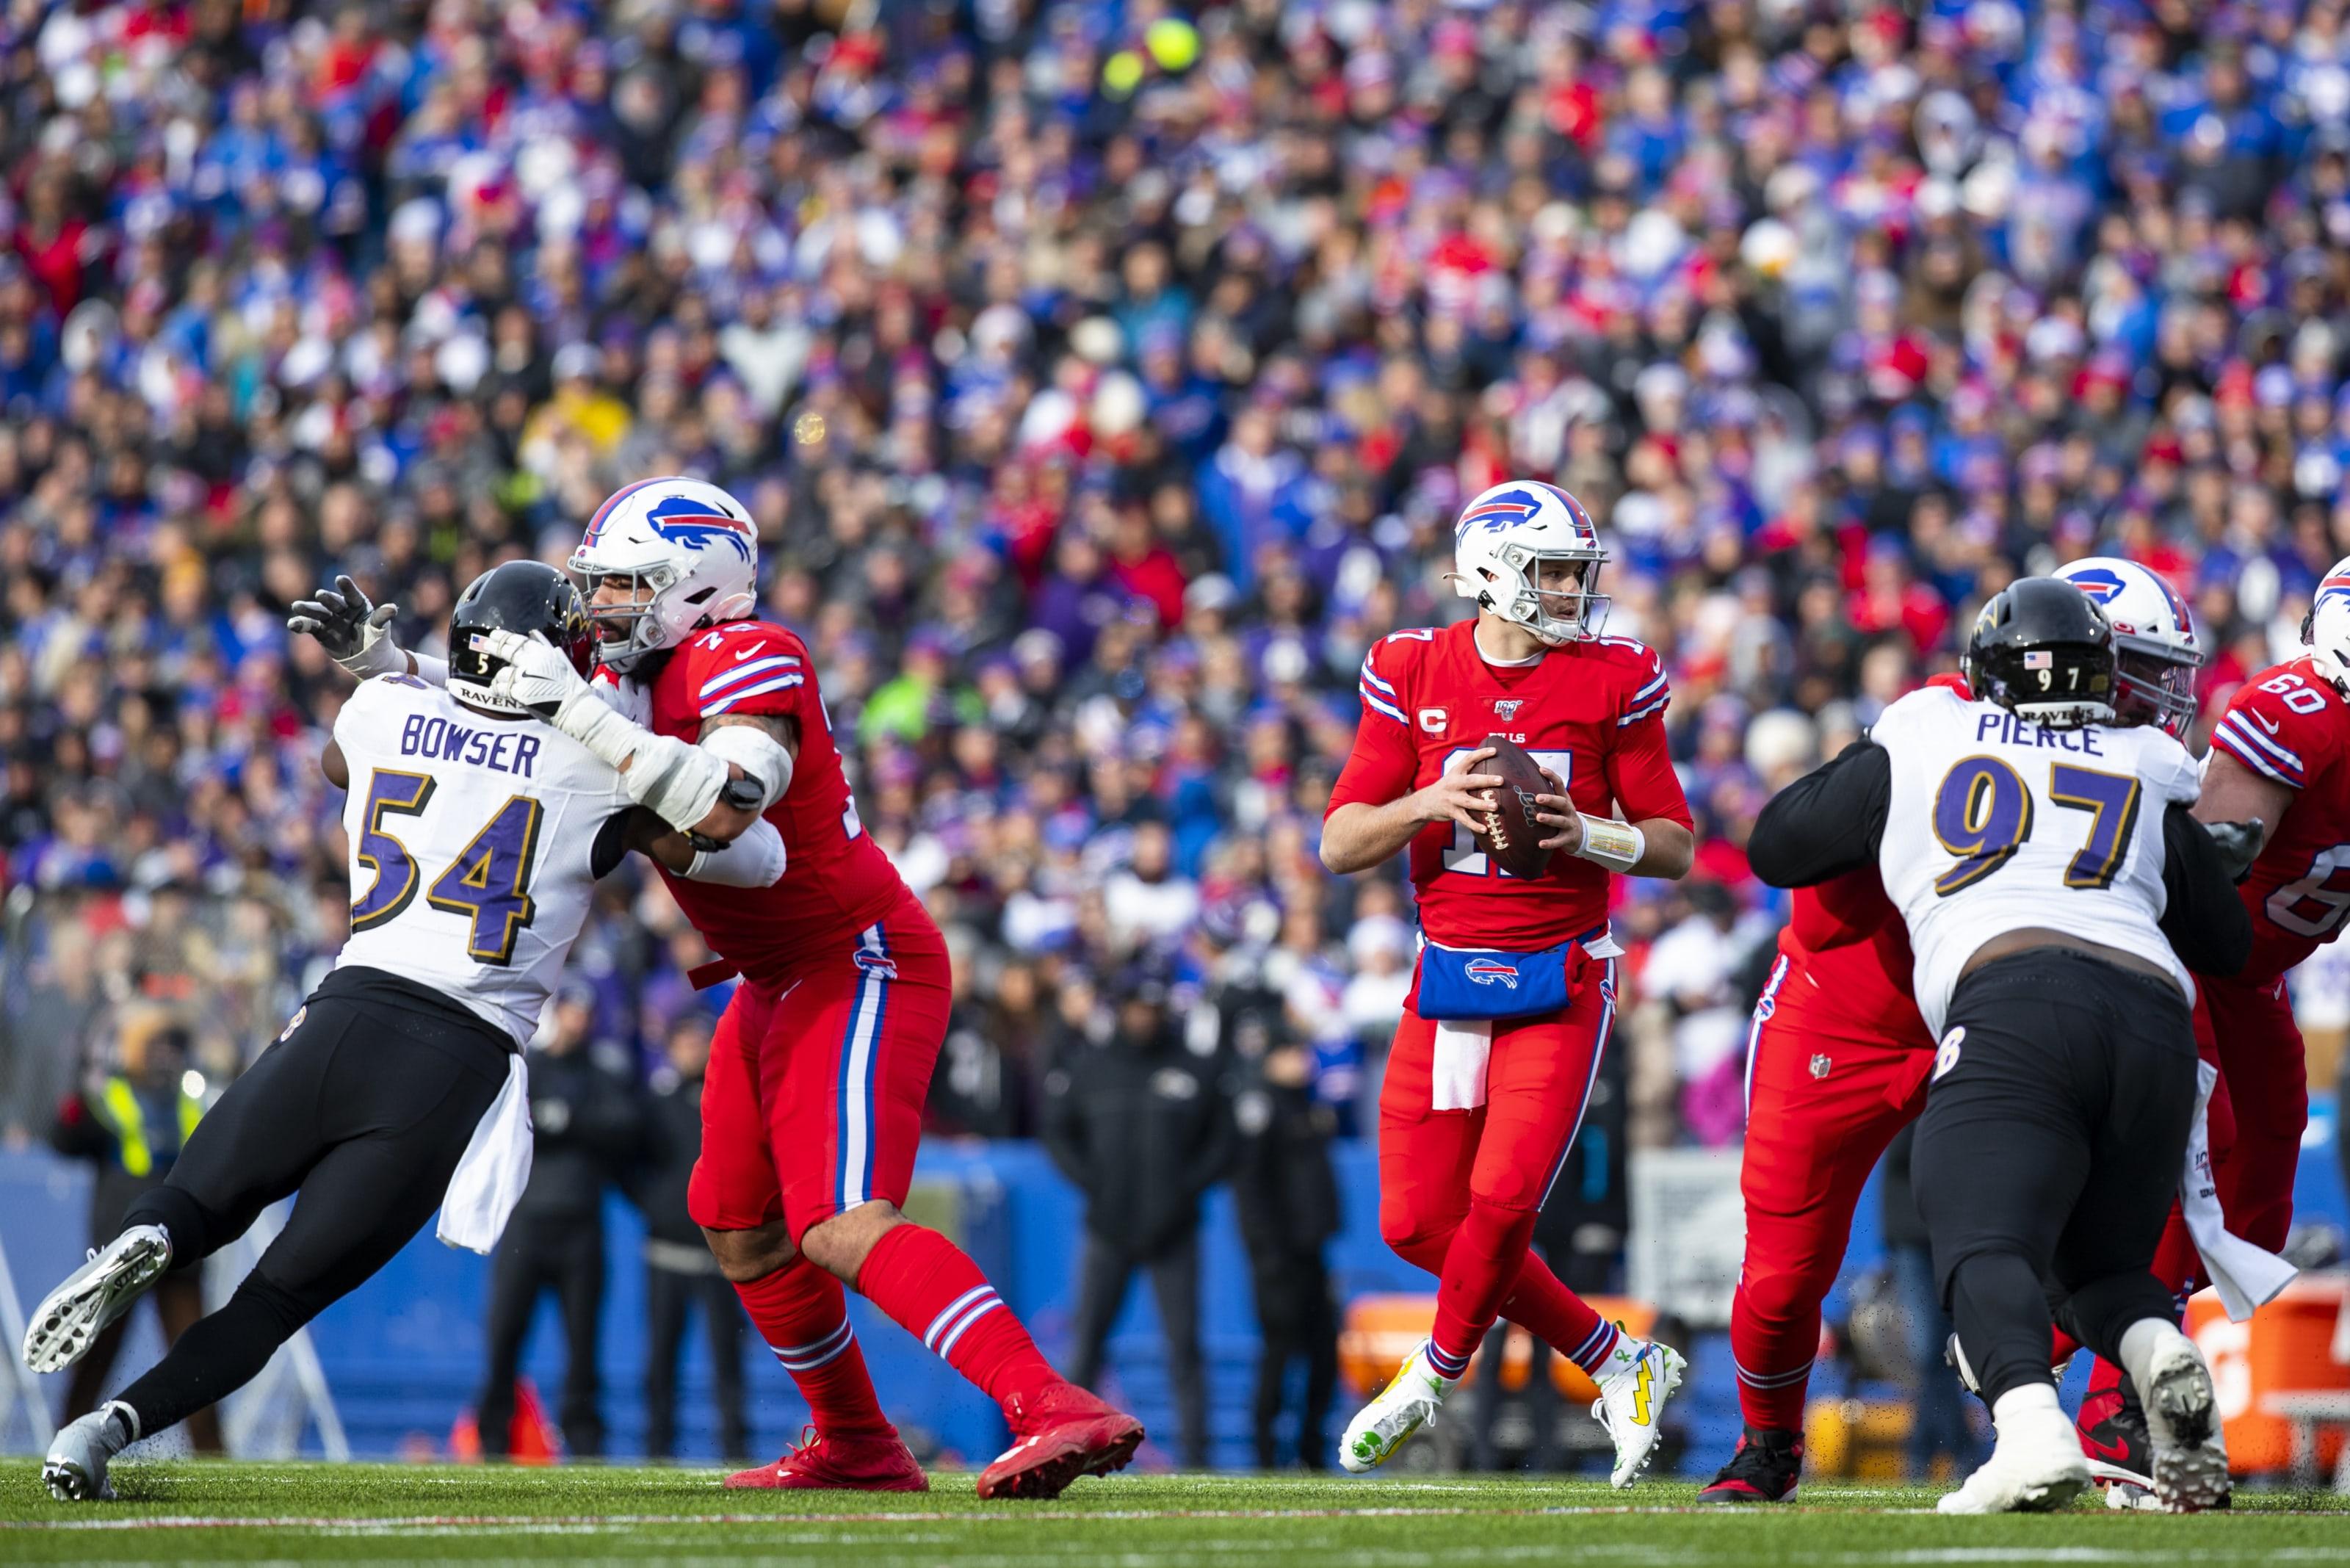 Buffalo Bills vs Ravens: Divisional Round playoff preview, predictions